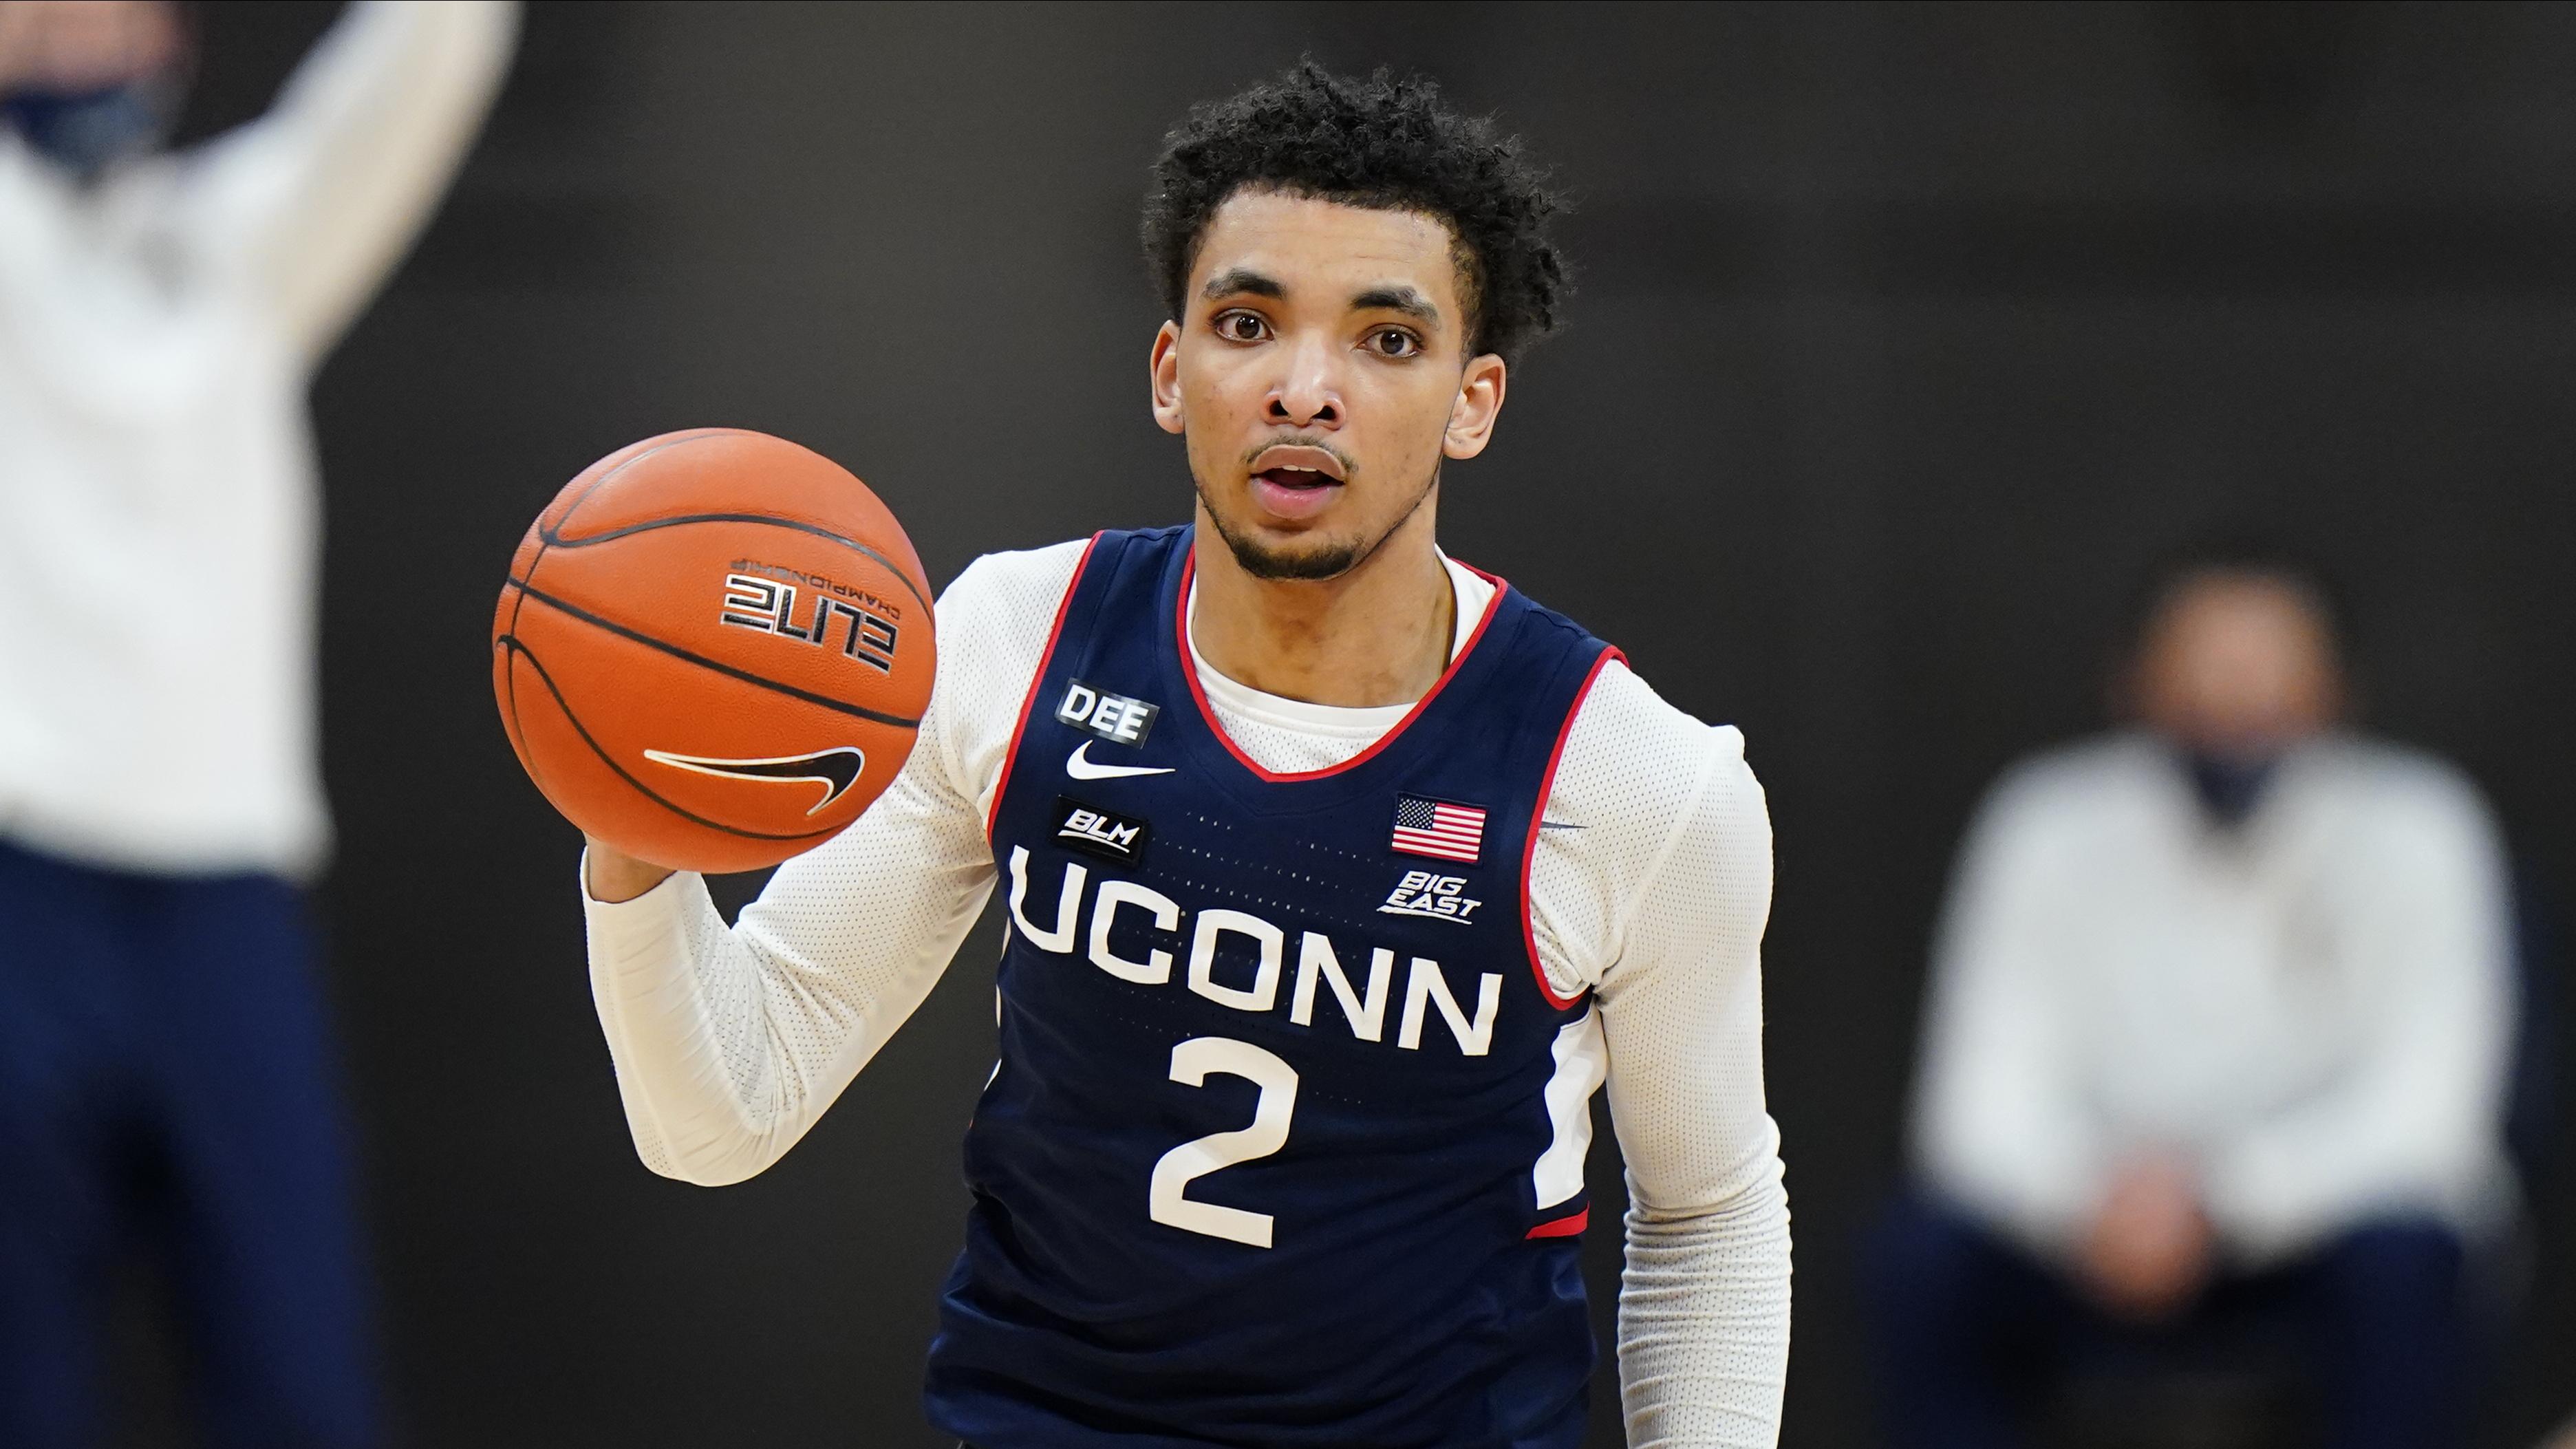 Connecticut's James Bouknight plays during an NCAA college basketball game against Villanova, Saturday, Feb. 20, 2021, in Villanova, Pa.